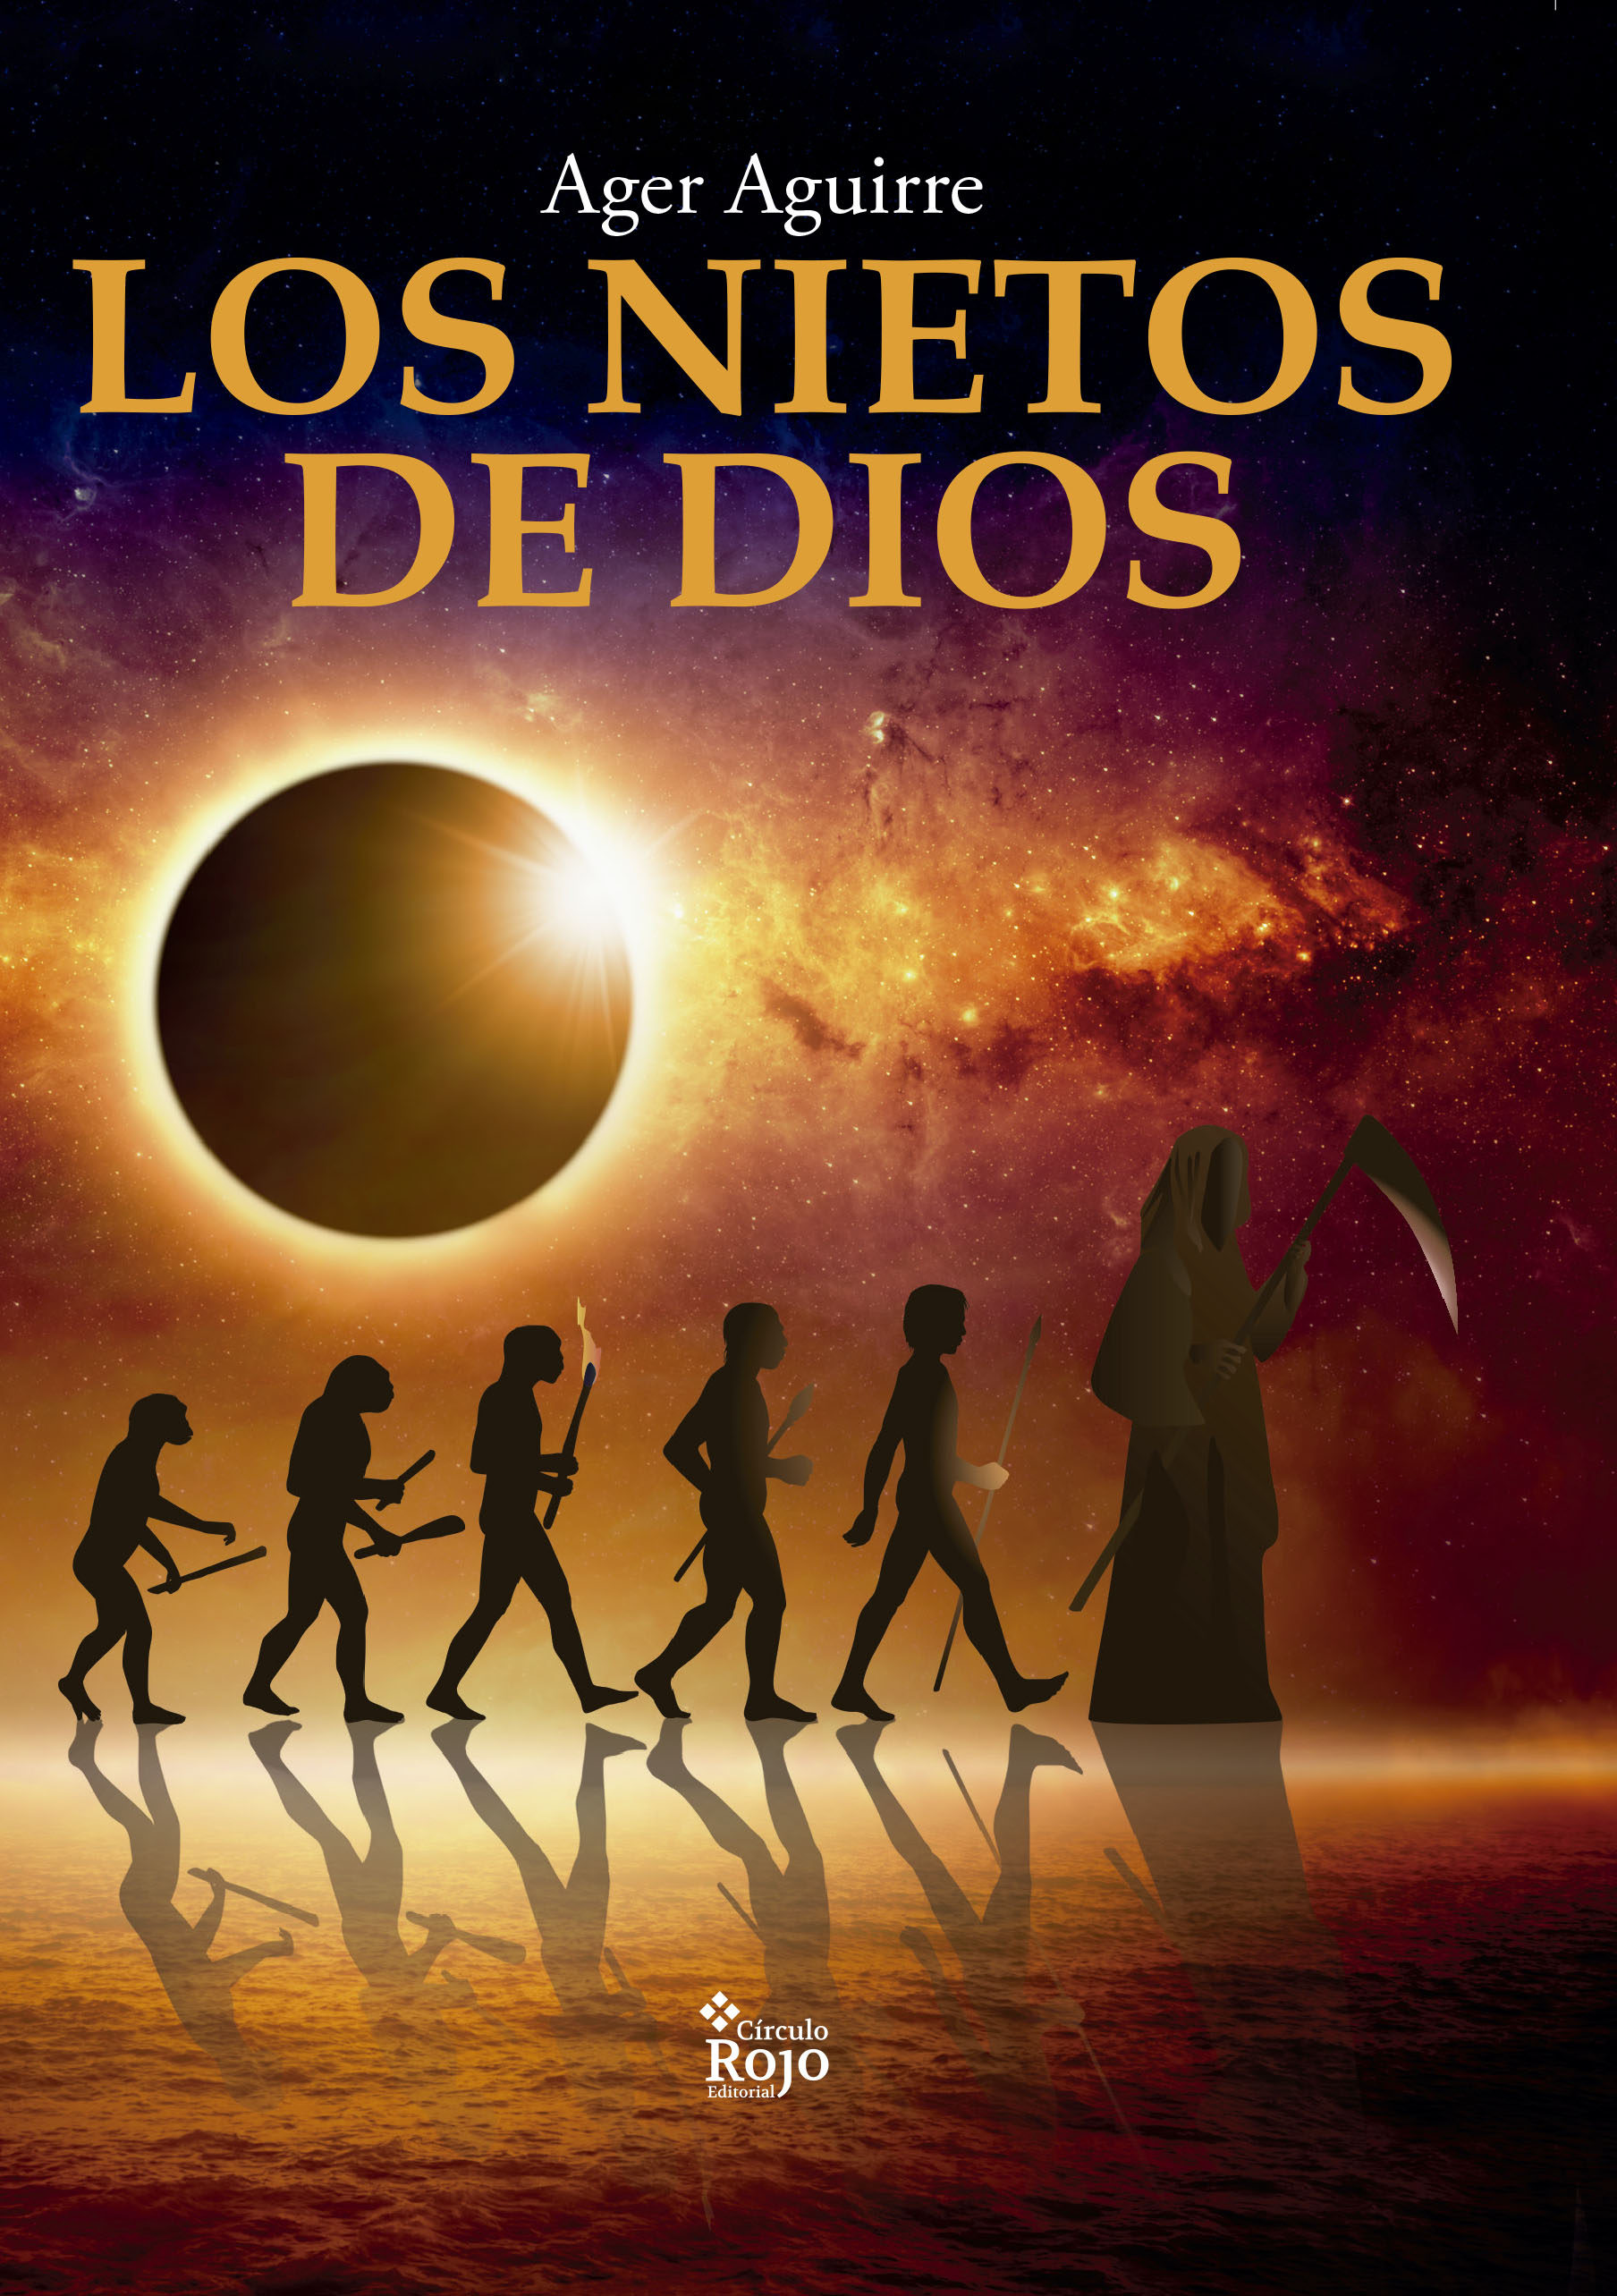 https://atravesdunlibro.blogspot.com.es/2017/07/resena-los-nietos-de-dios-ager-aguirre.html